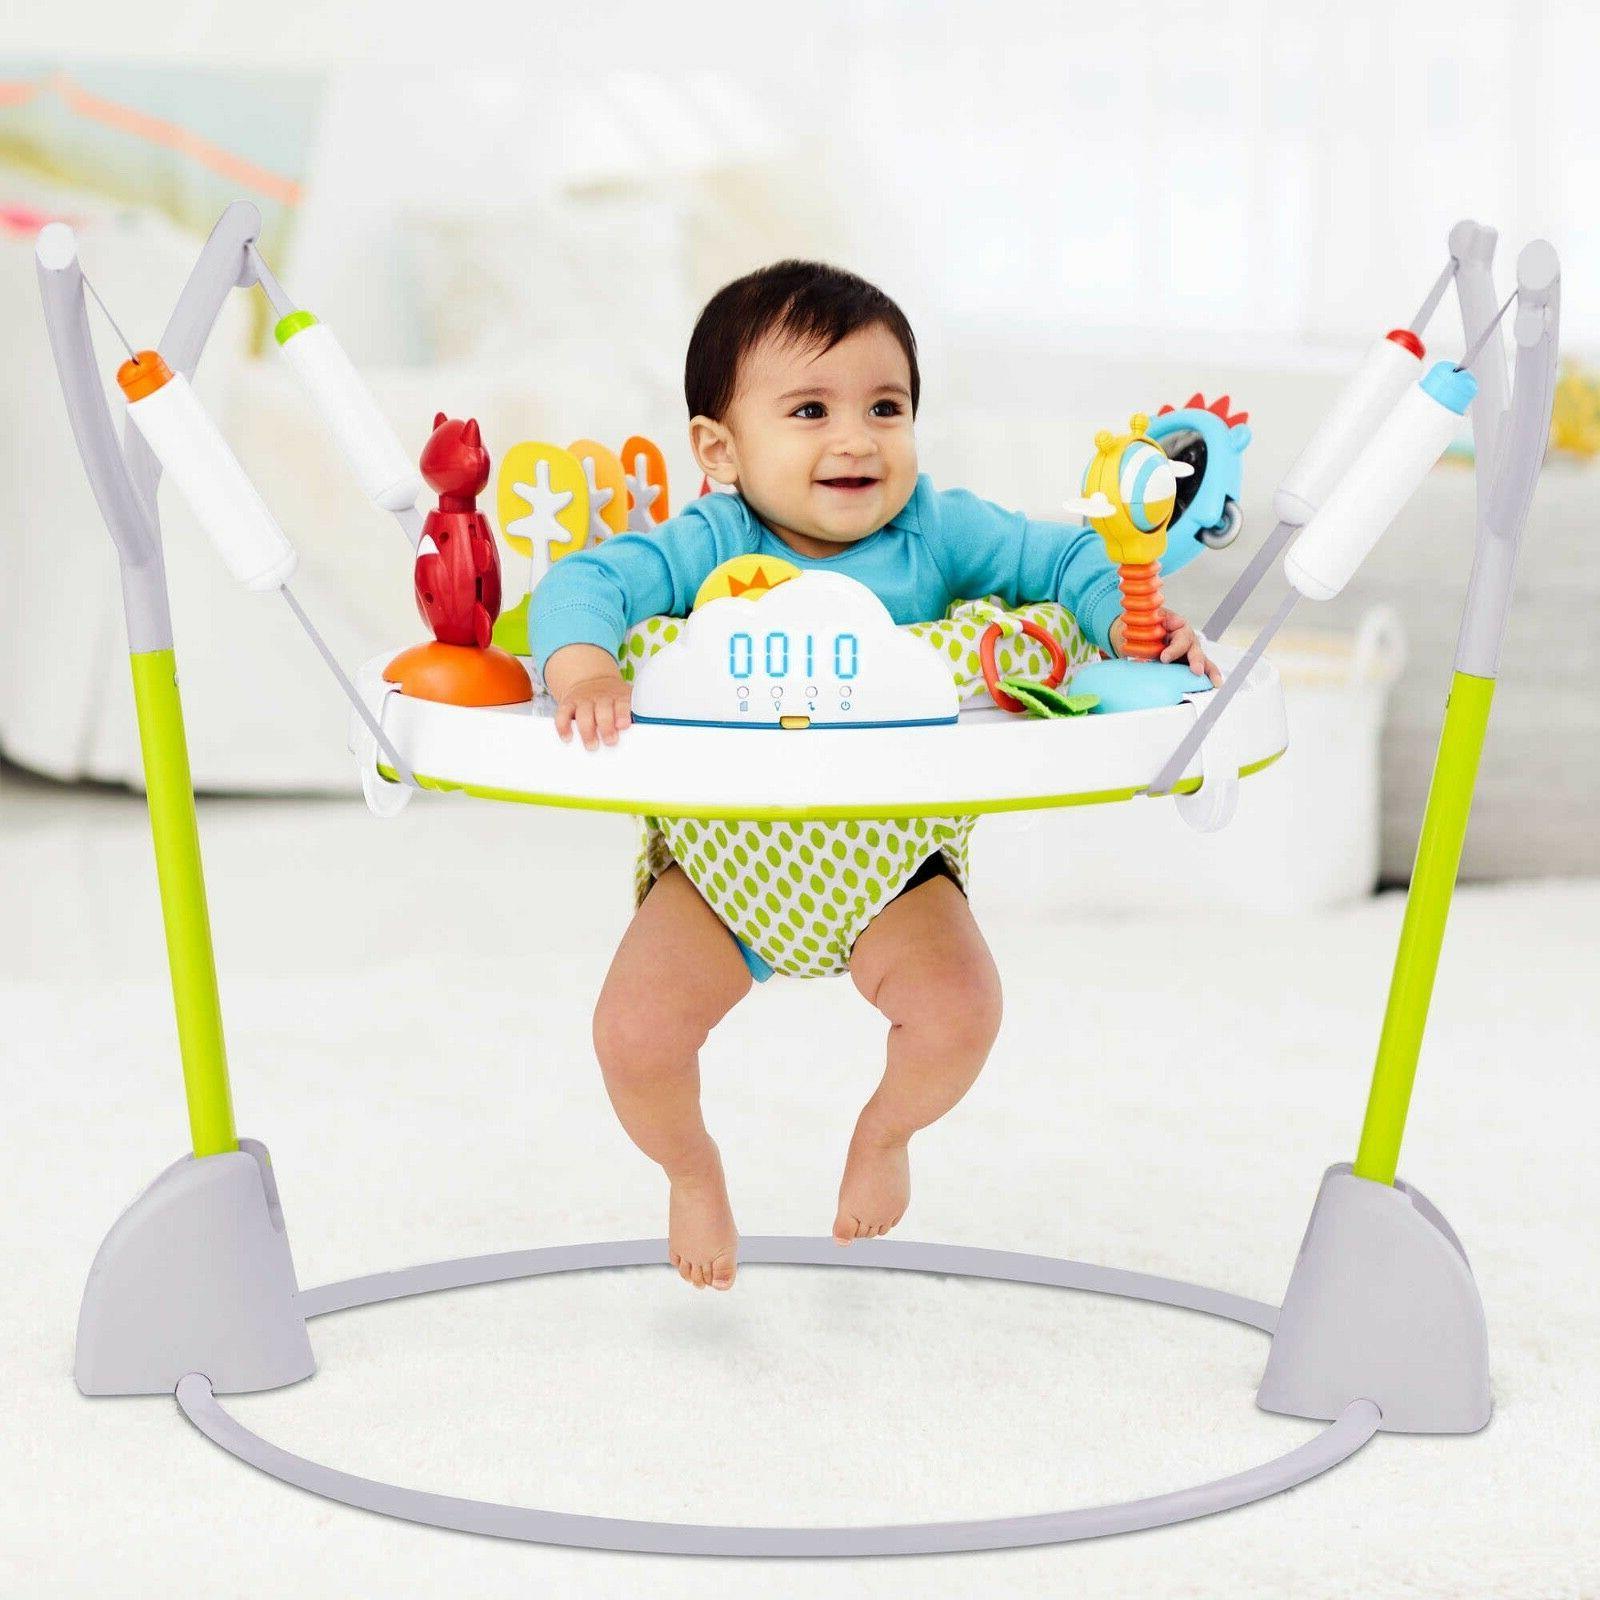 SKIP & More Baby